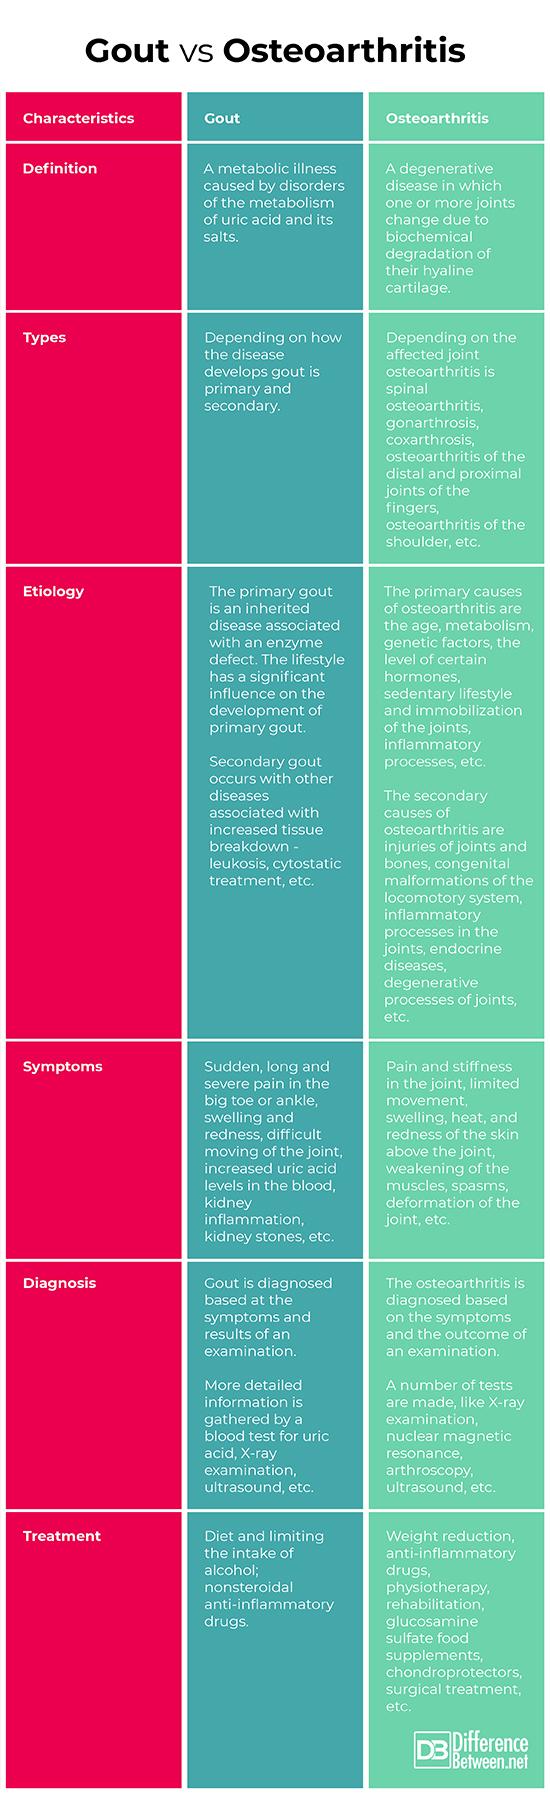 Gout vs Osteoarthritis